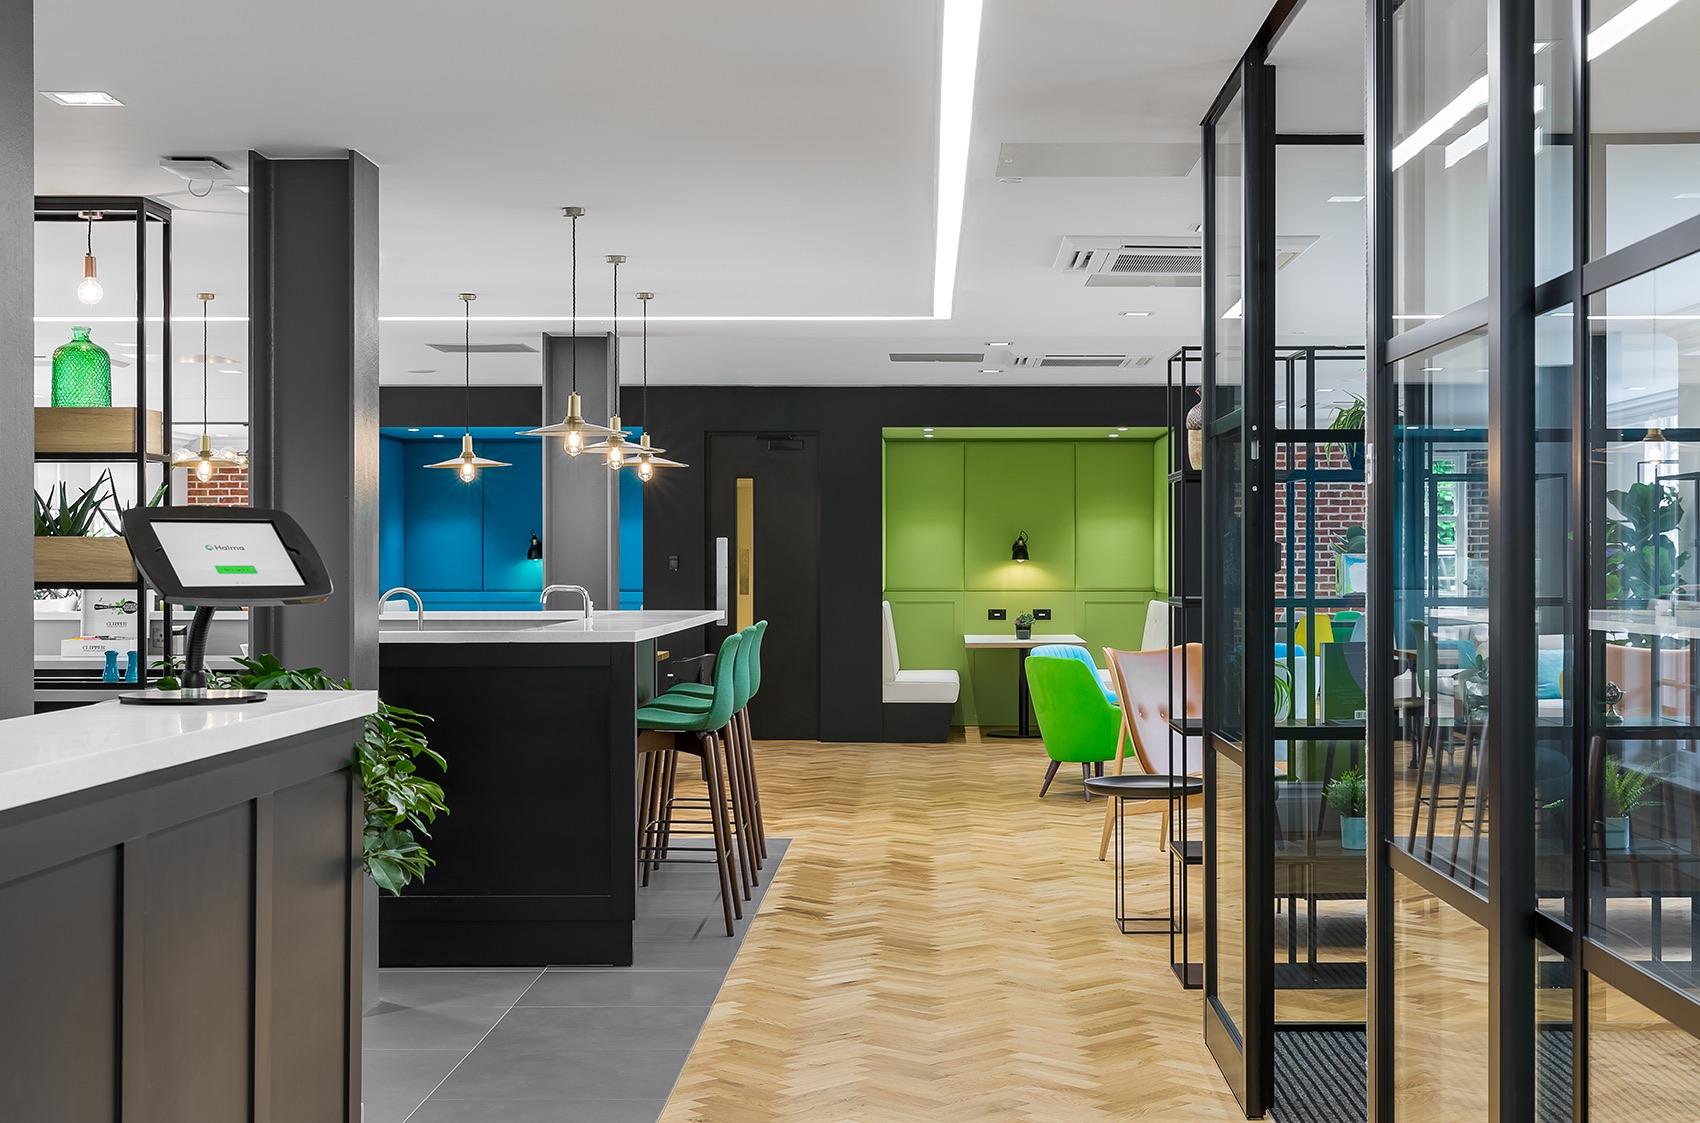 halma-amersham-office-9